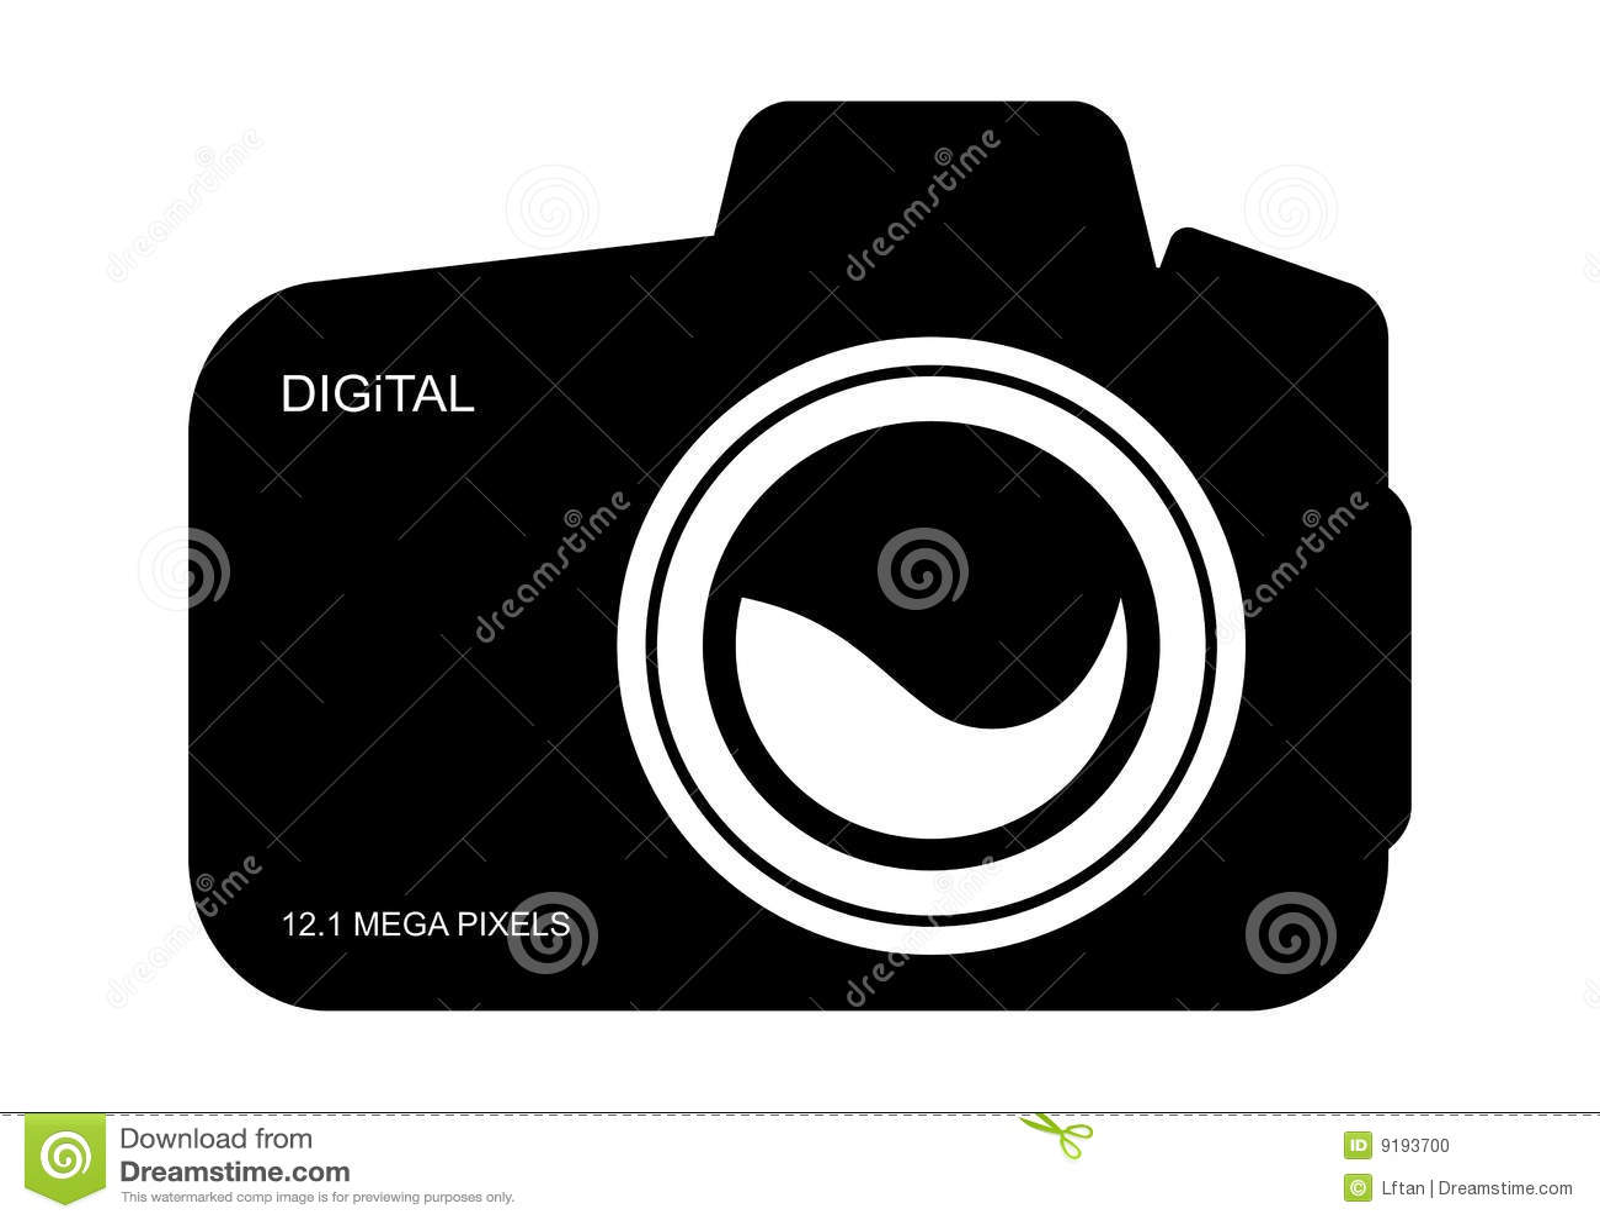 Digital Camera Icon Stock Vector Illustration Of Icon 9193700